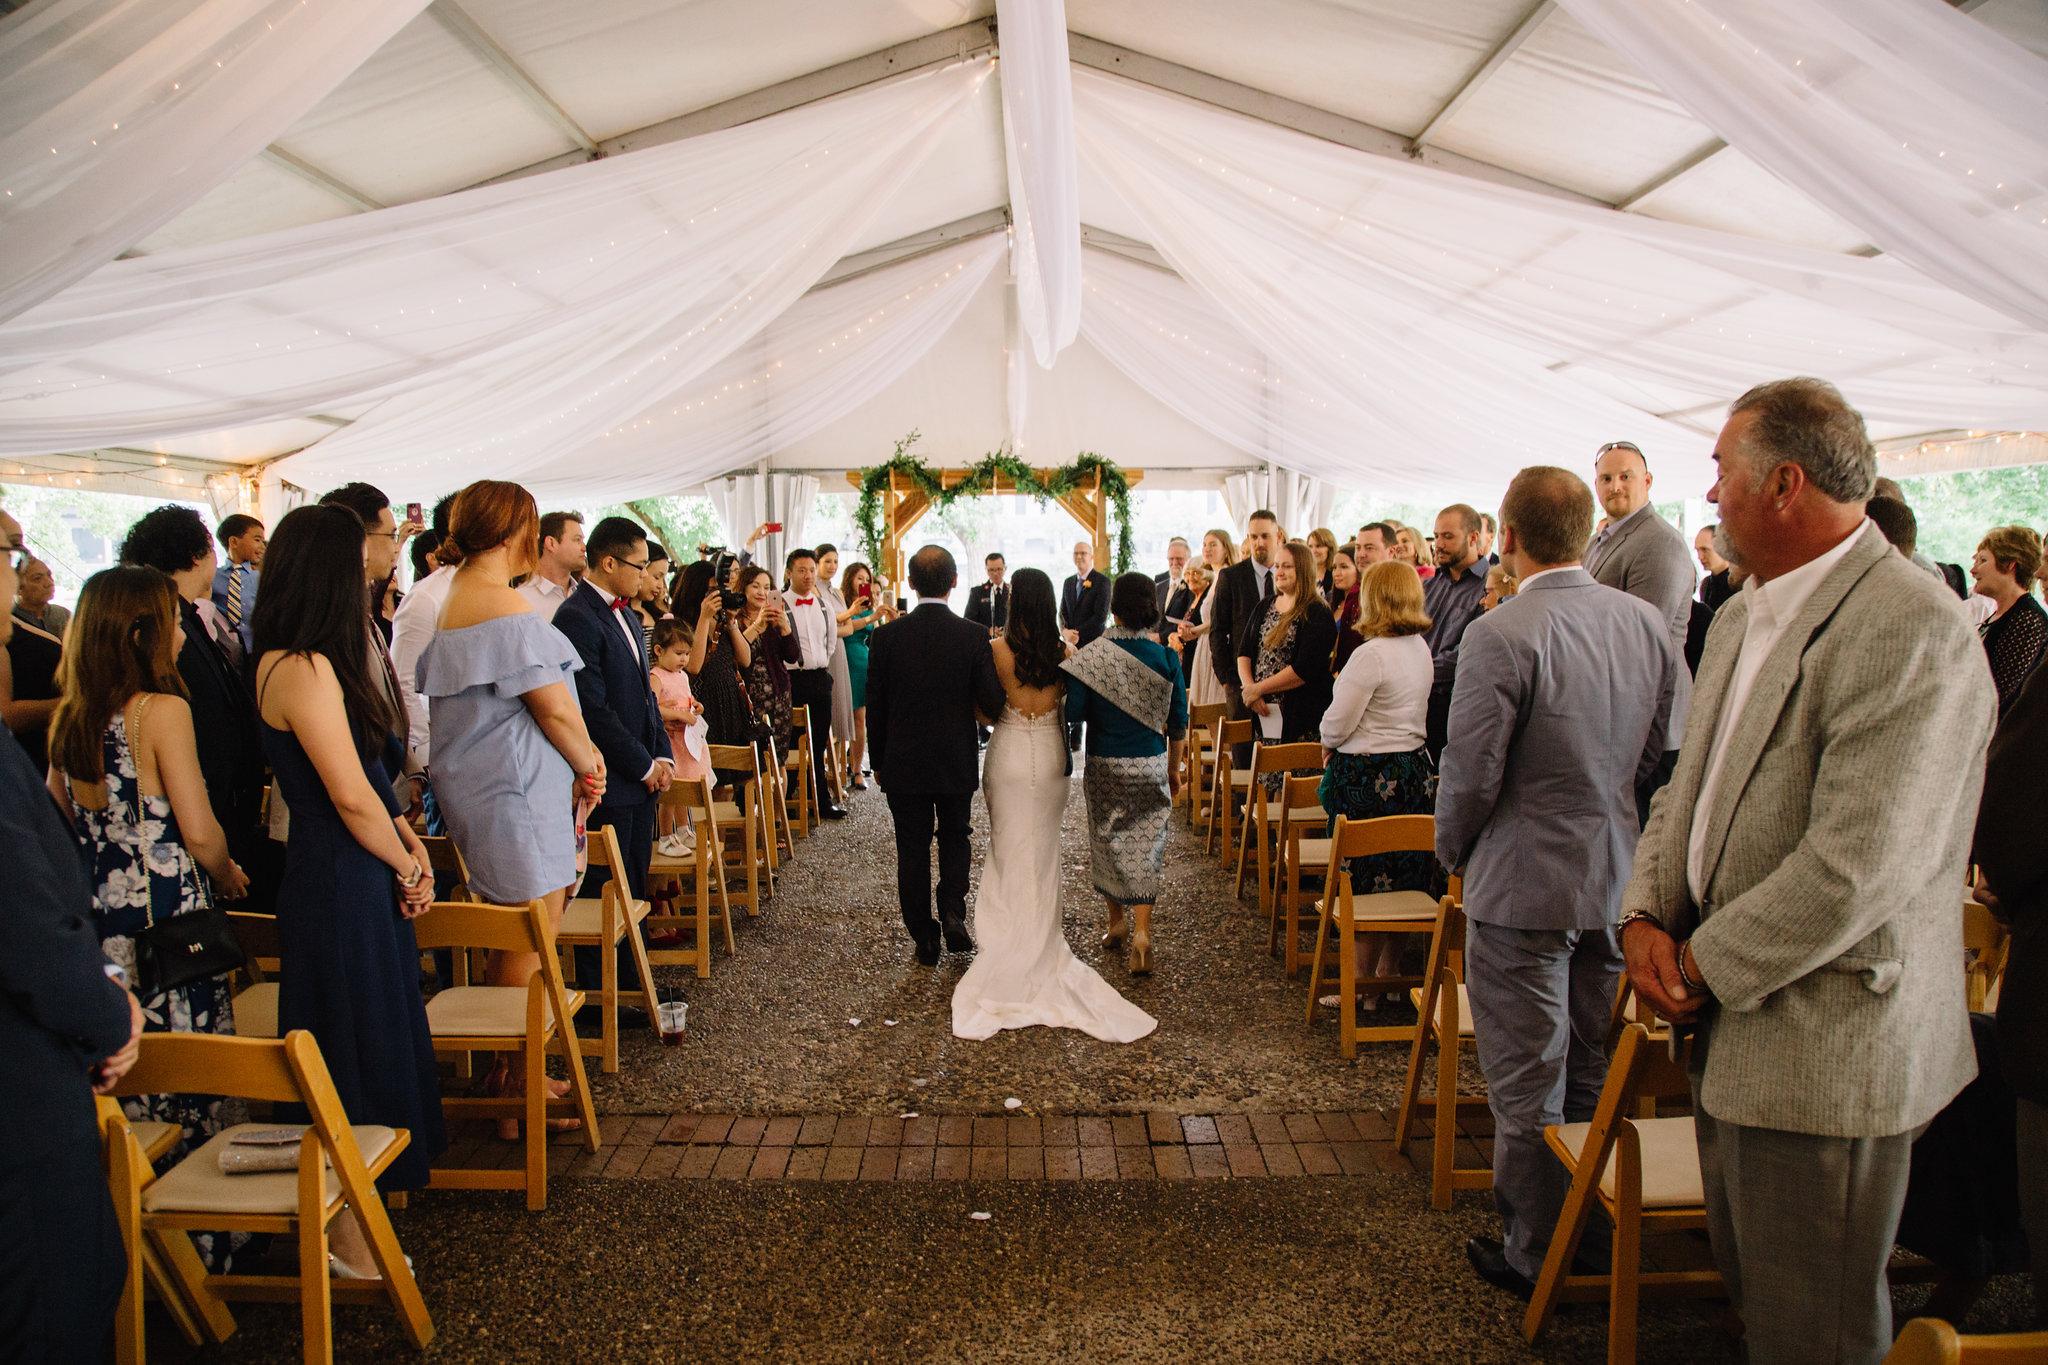 rain back up plan, tent draping, Whims and Joy Minneapolis photographer :: Sixpence Events & Planning Minnesota wedding planner :: Nicollet Island Pavilion.jpg